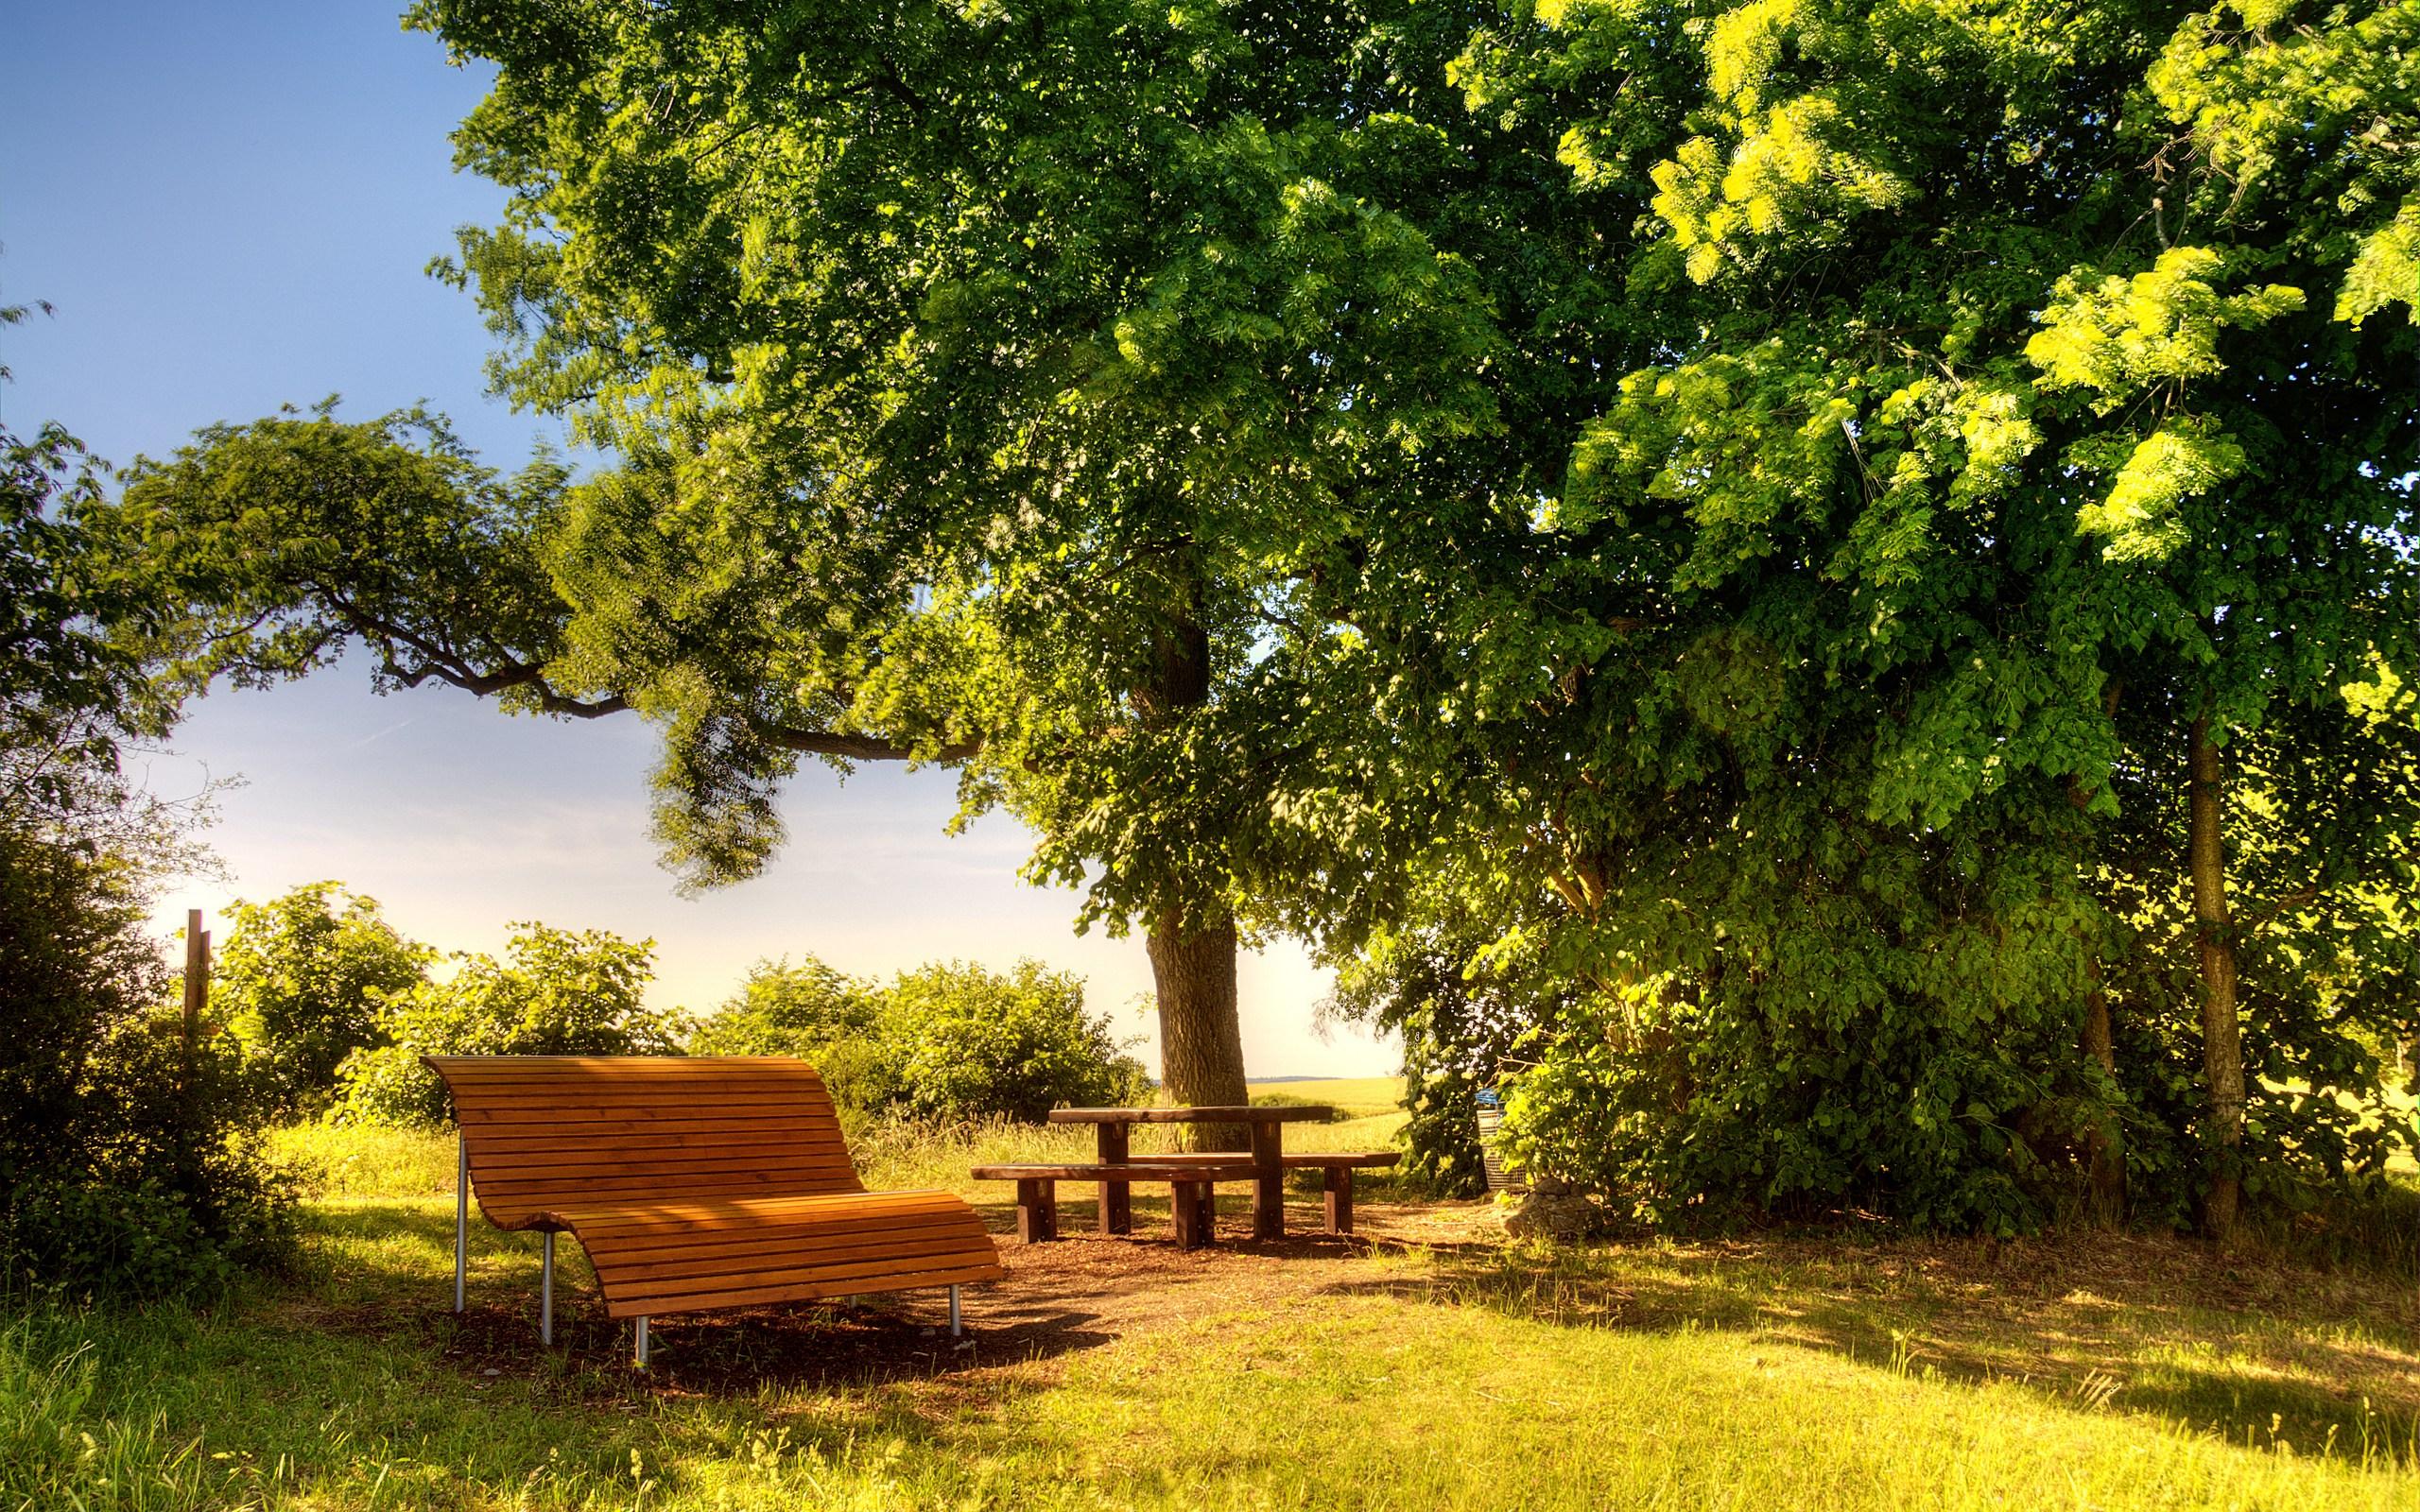 Beautiful Sunny Day wallpaper 2560x1600 29420 2560x1600